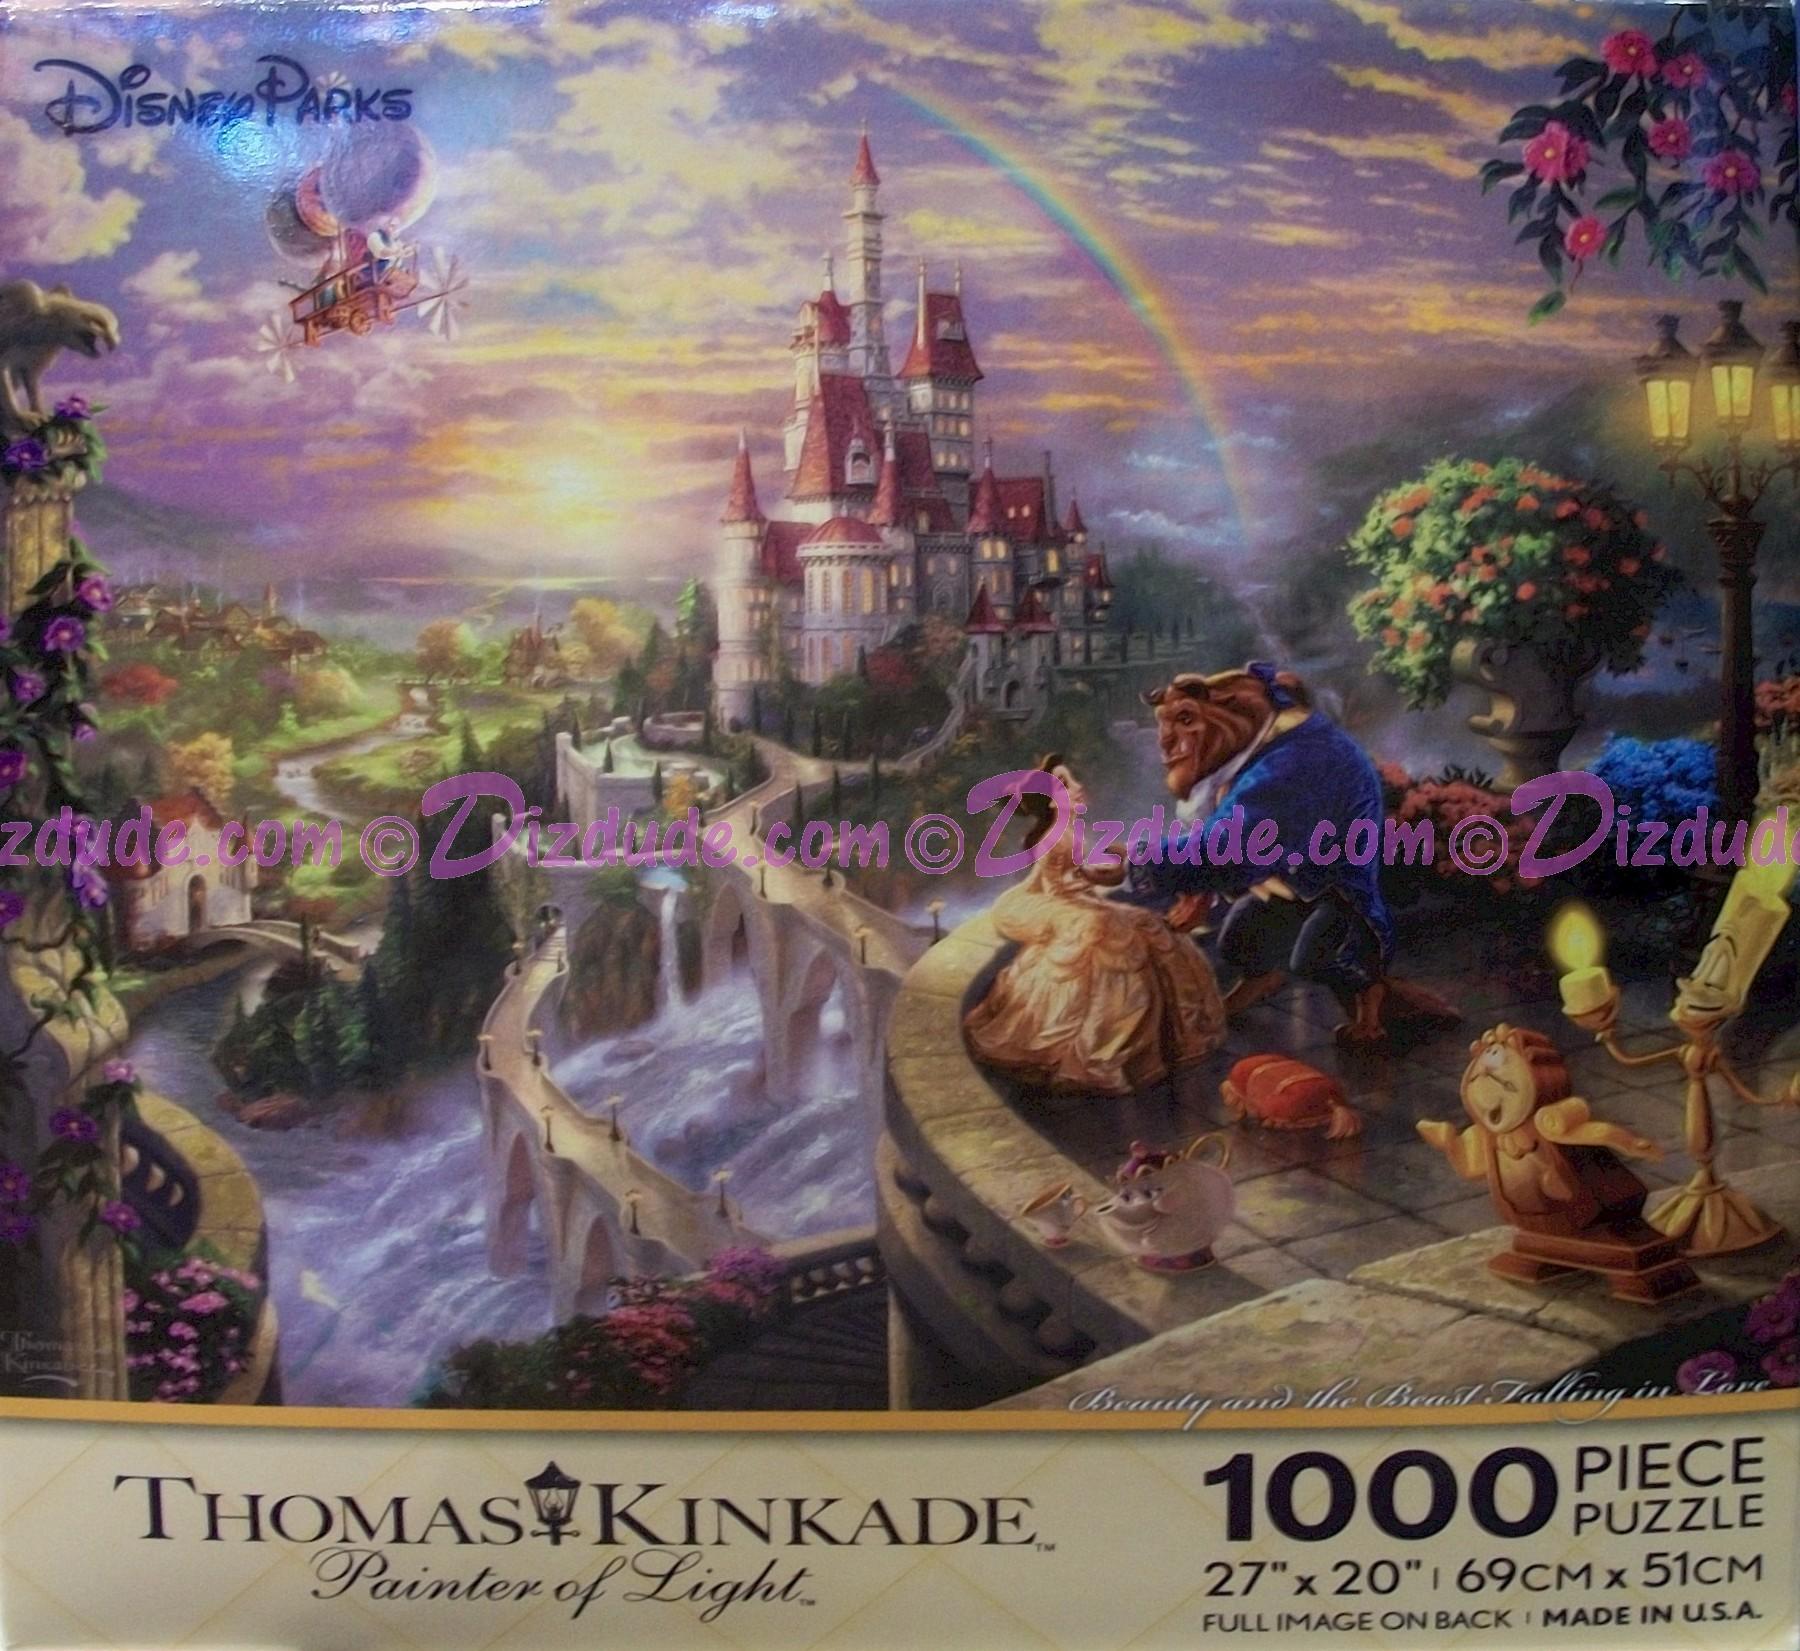 Disney World Beauty And The Beast 1000 Piece Thomas Kinkade Jigsaw Puzzle © Dizdude.com